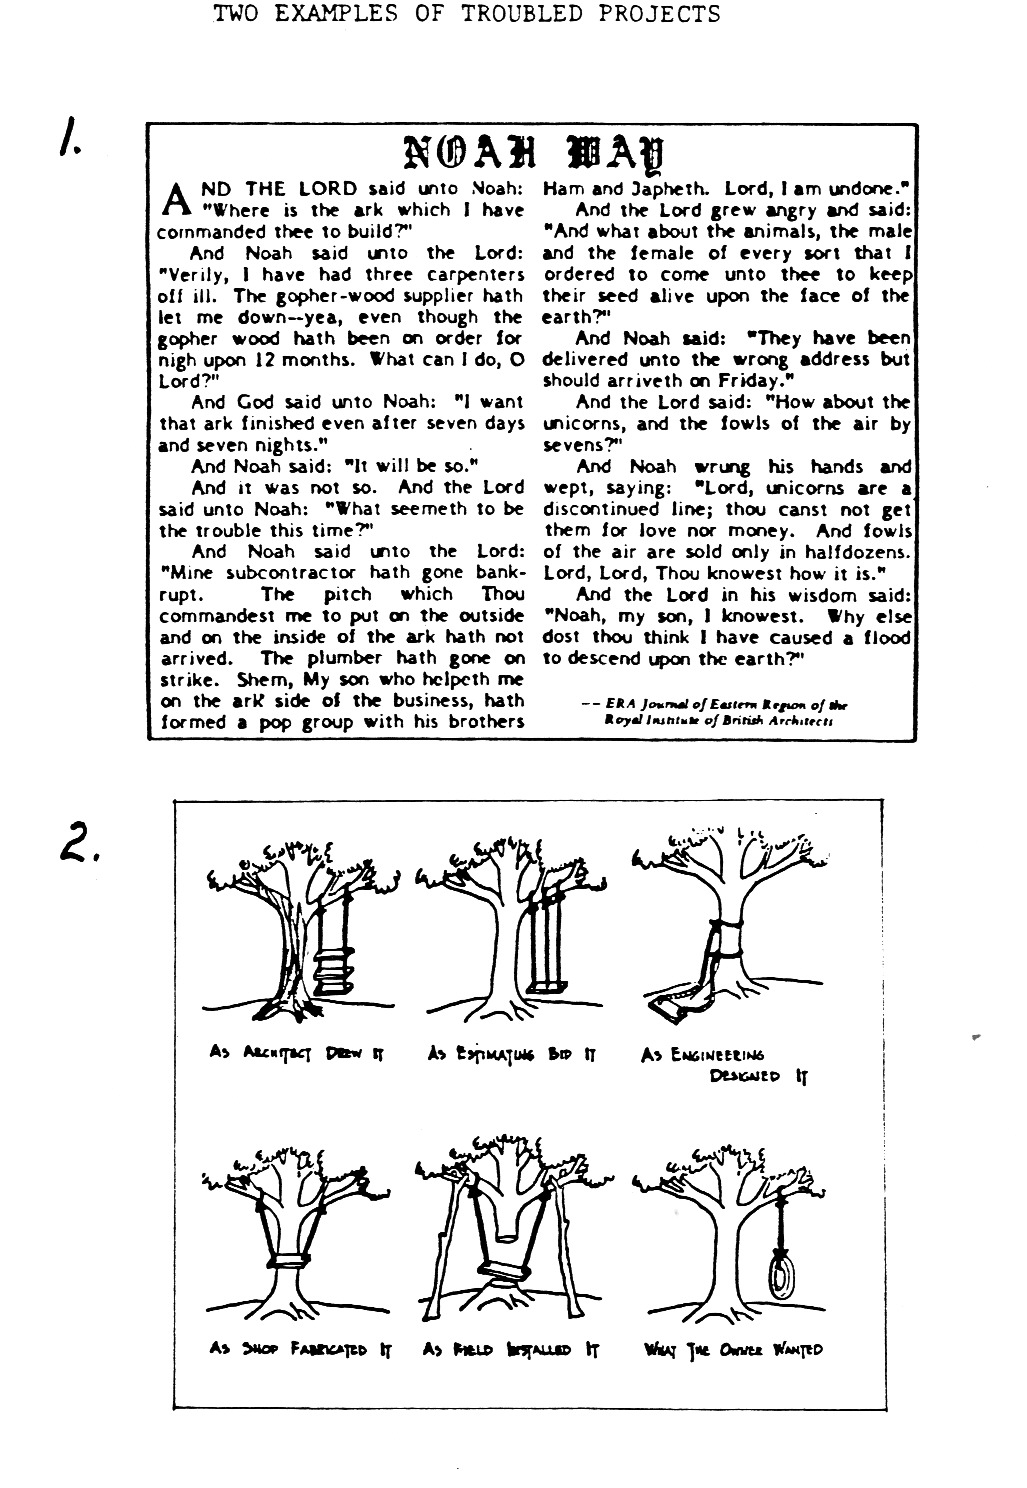 Tree swing meme what the customer really wanted - Tree Swing Cartoon Parodies